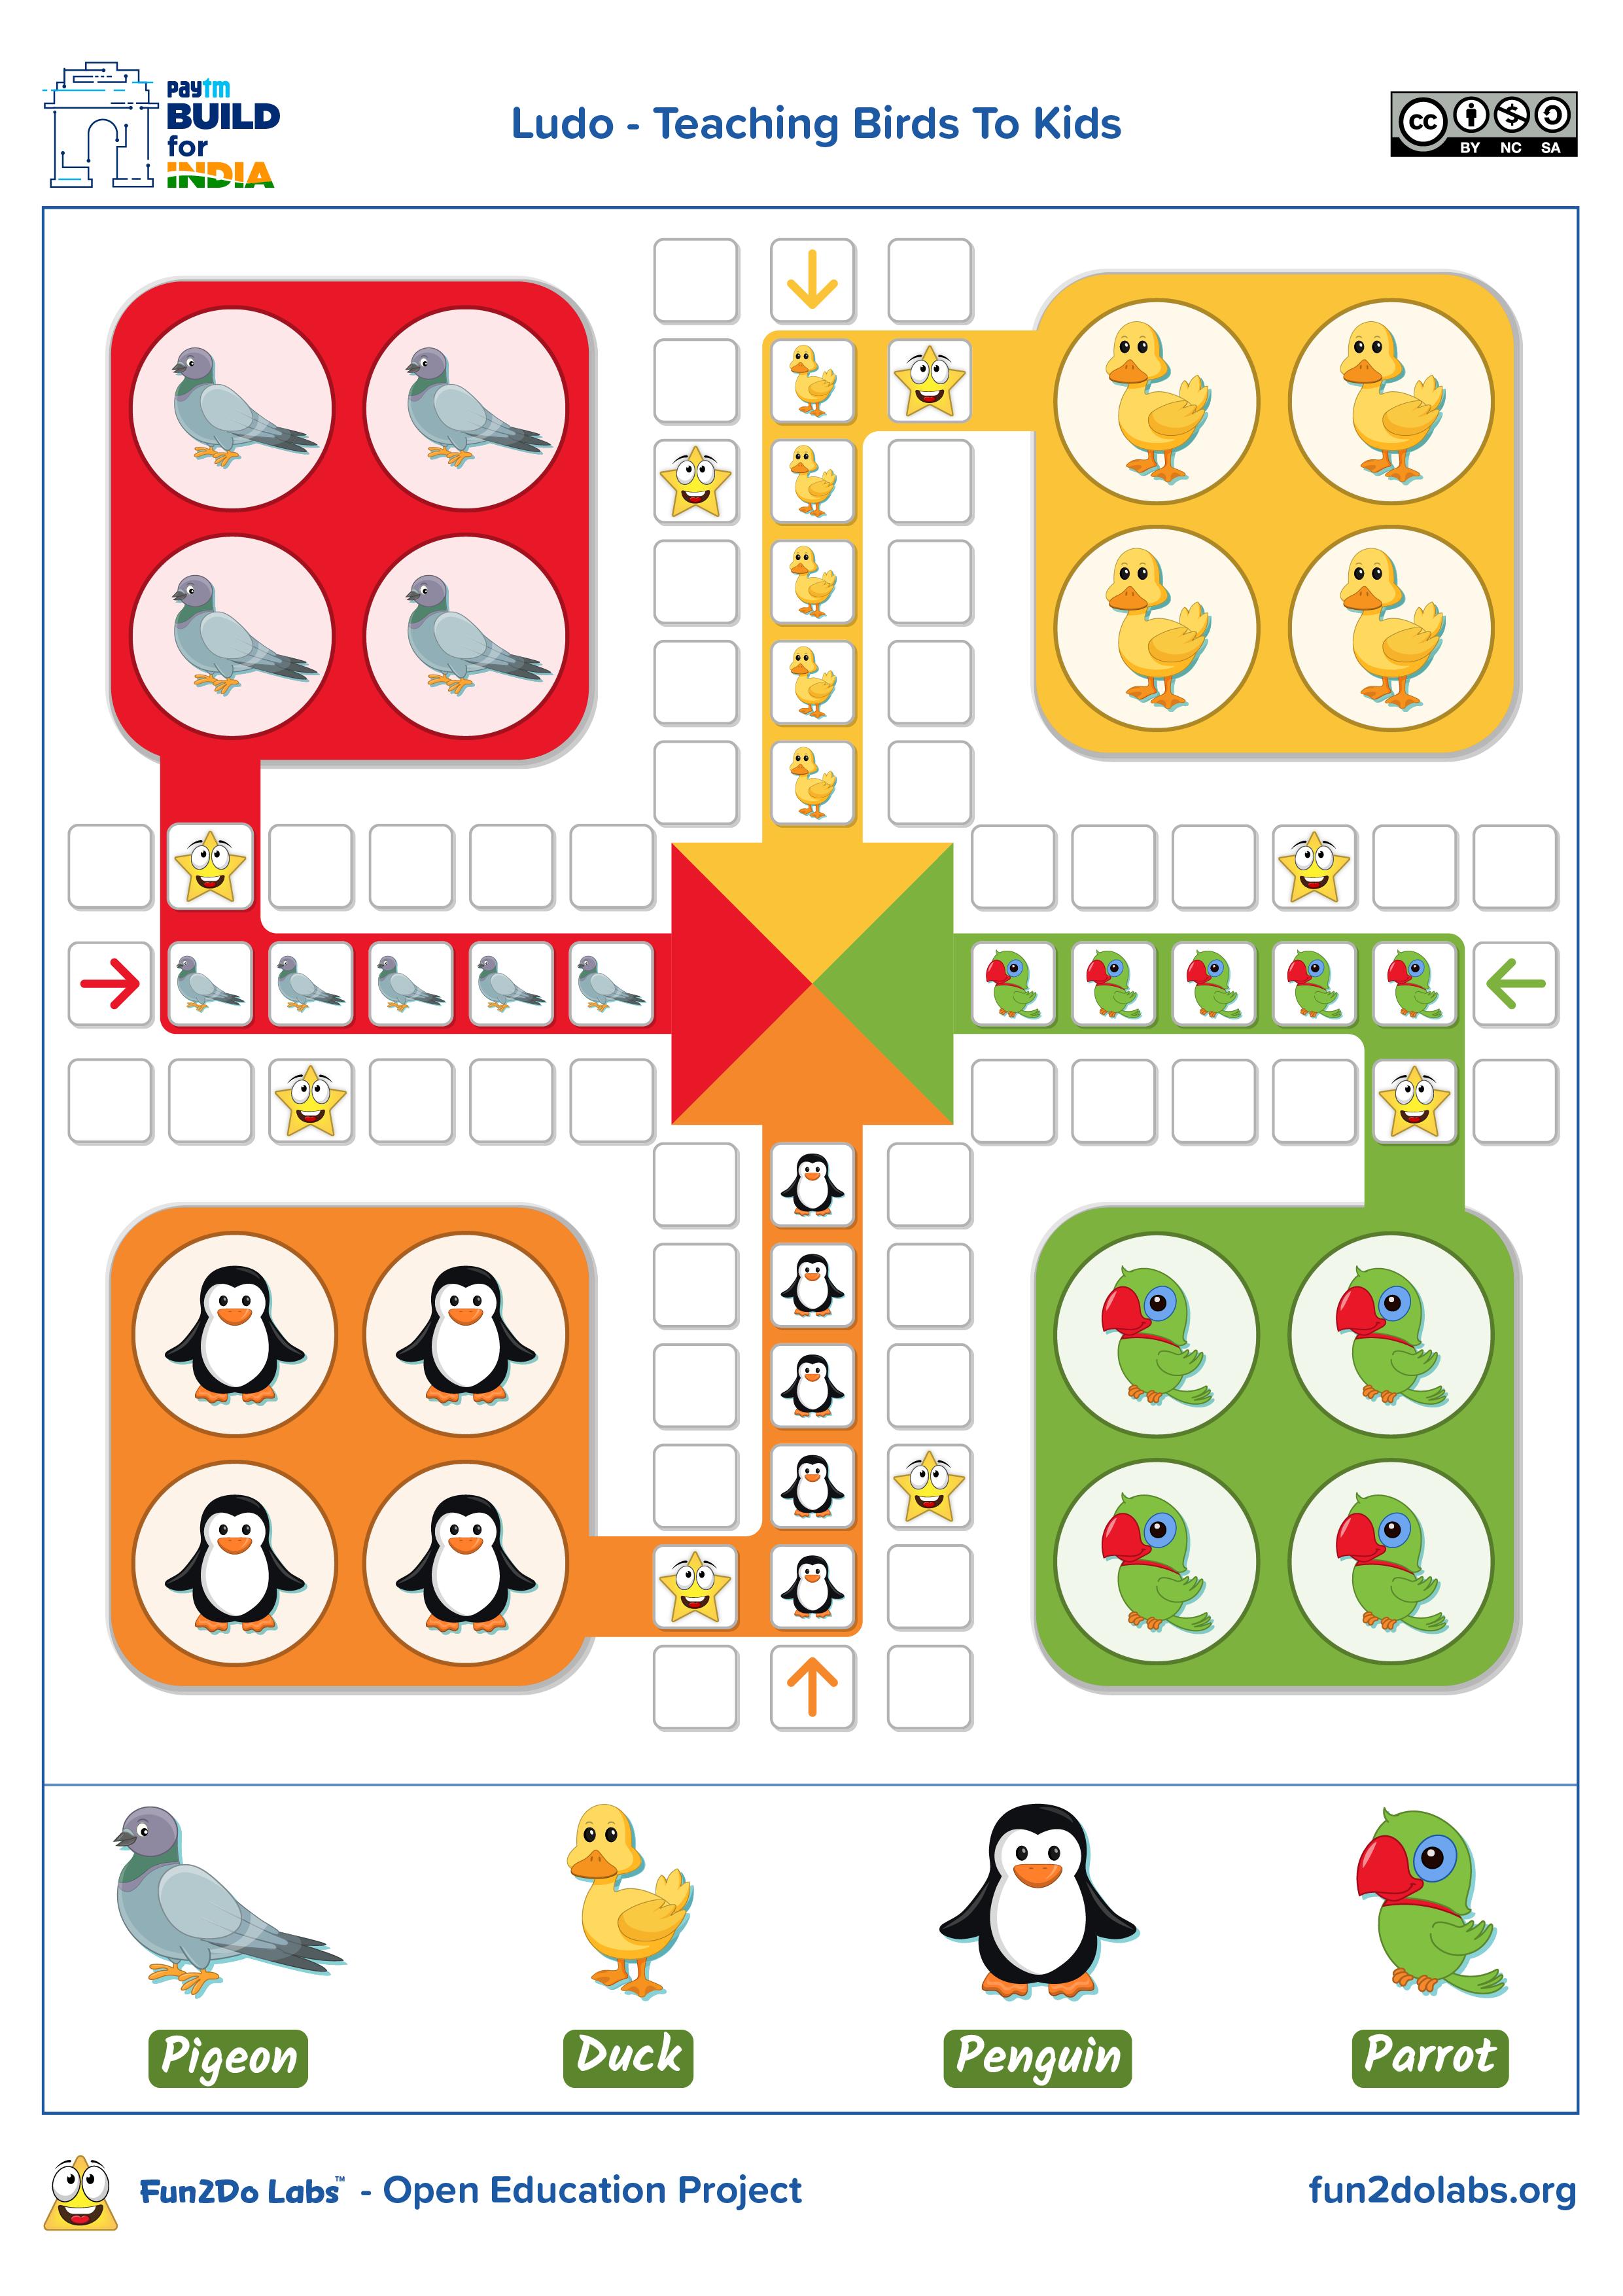 Teaching Birds To Kids Using Ludo Board Game